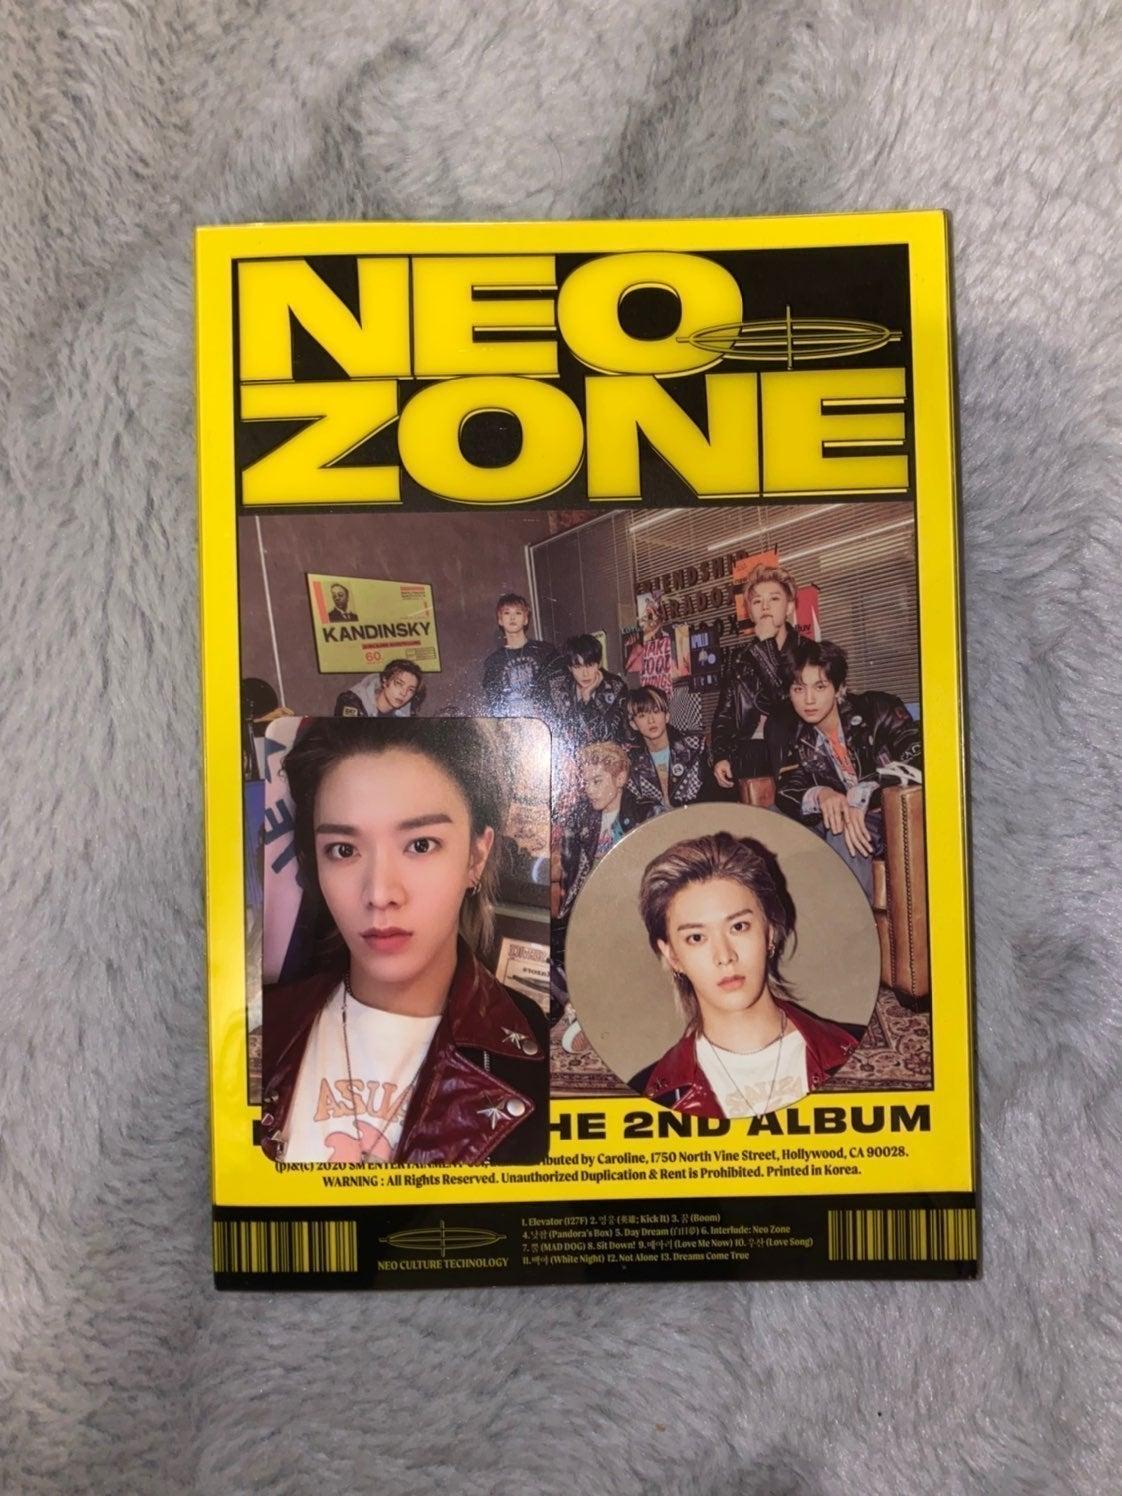 neozone album nct 127 yuta